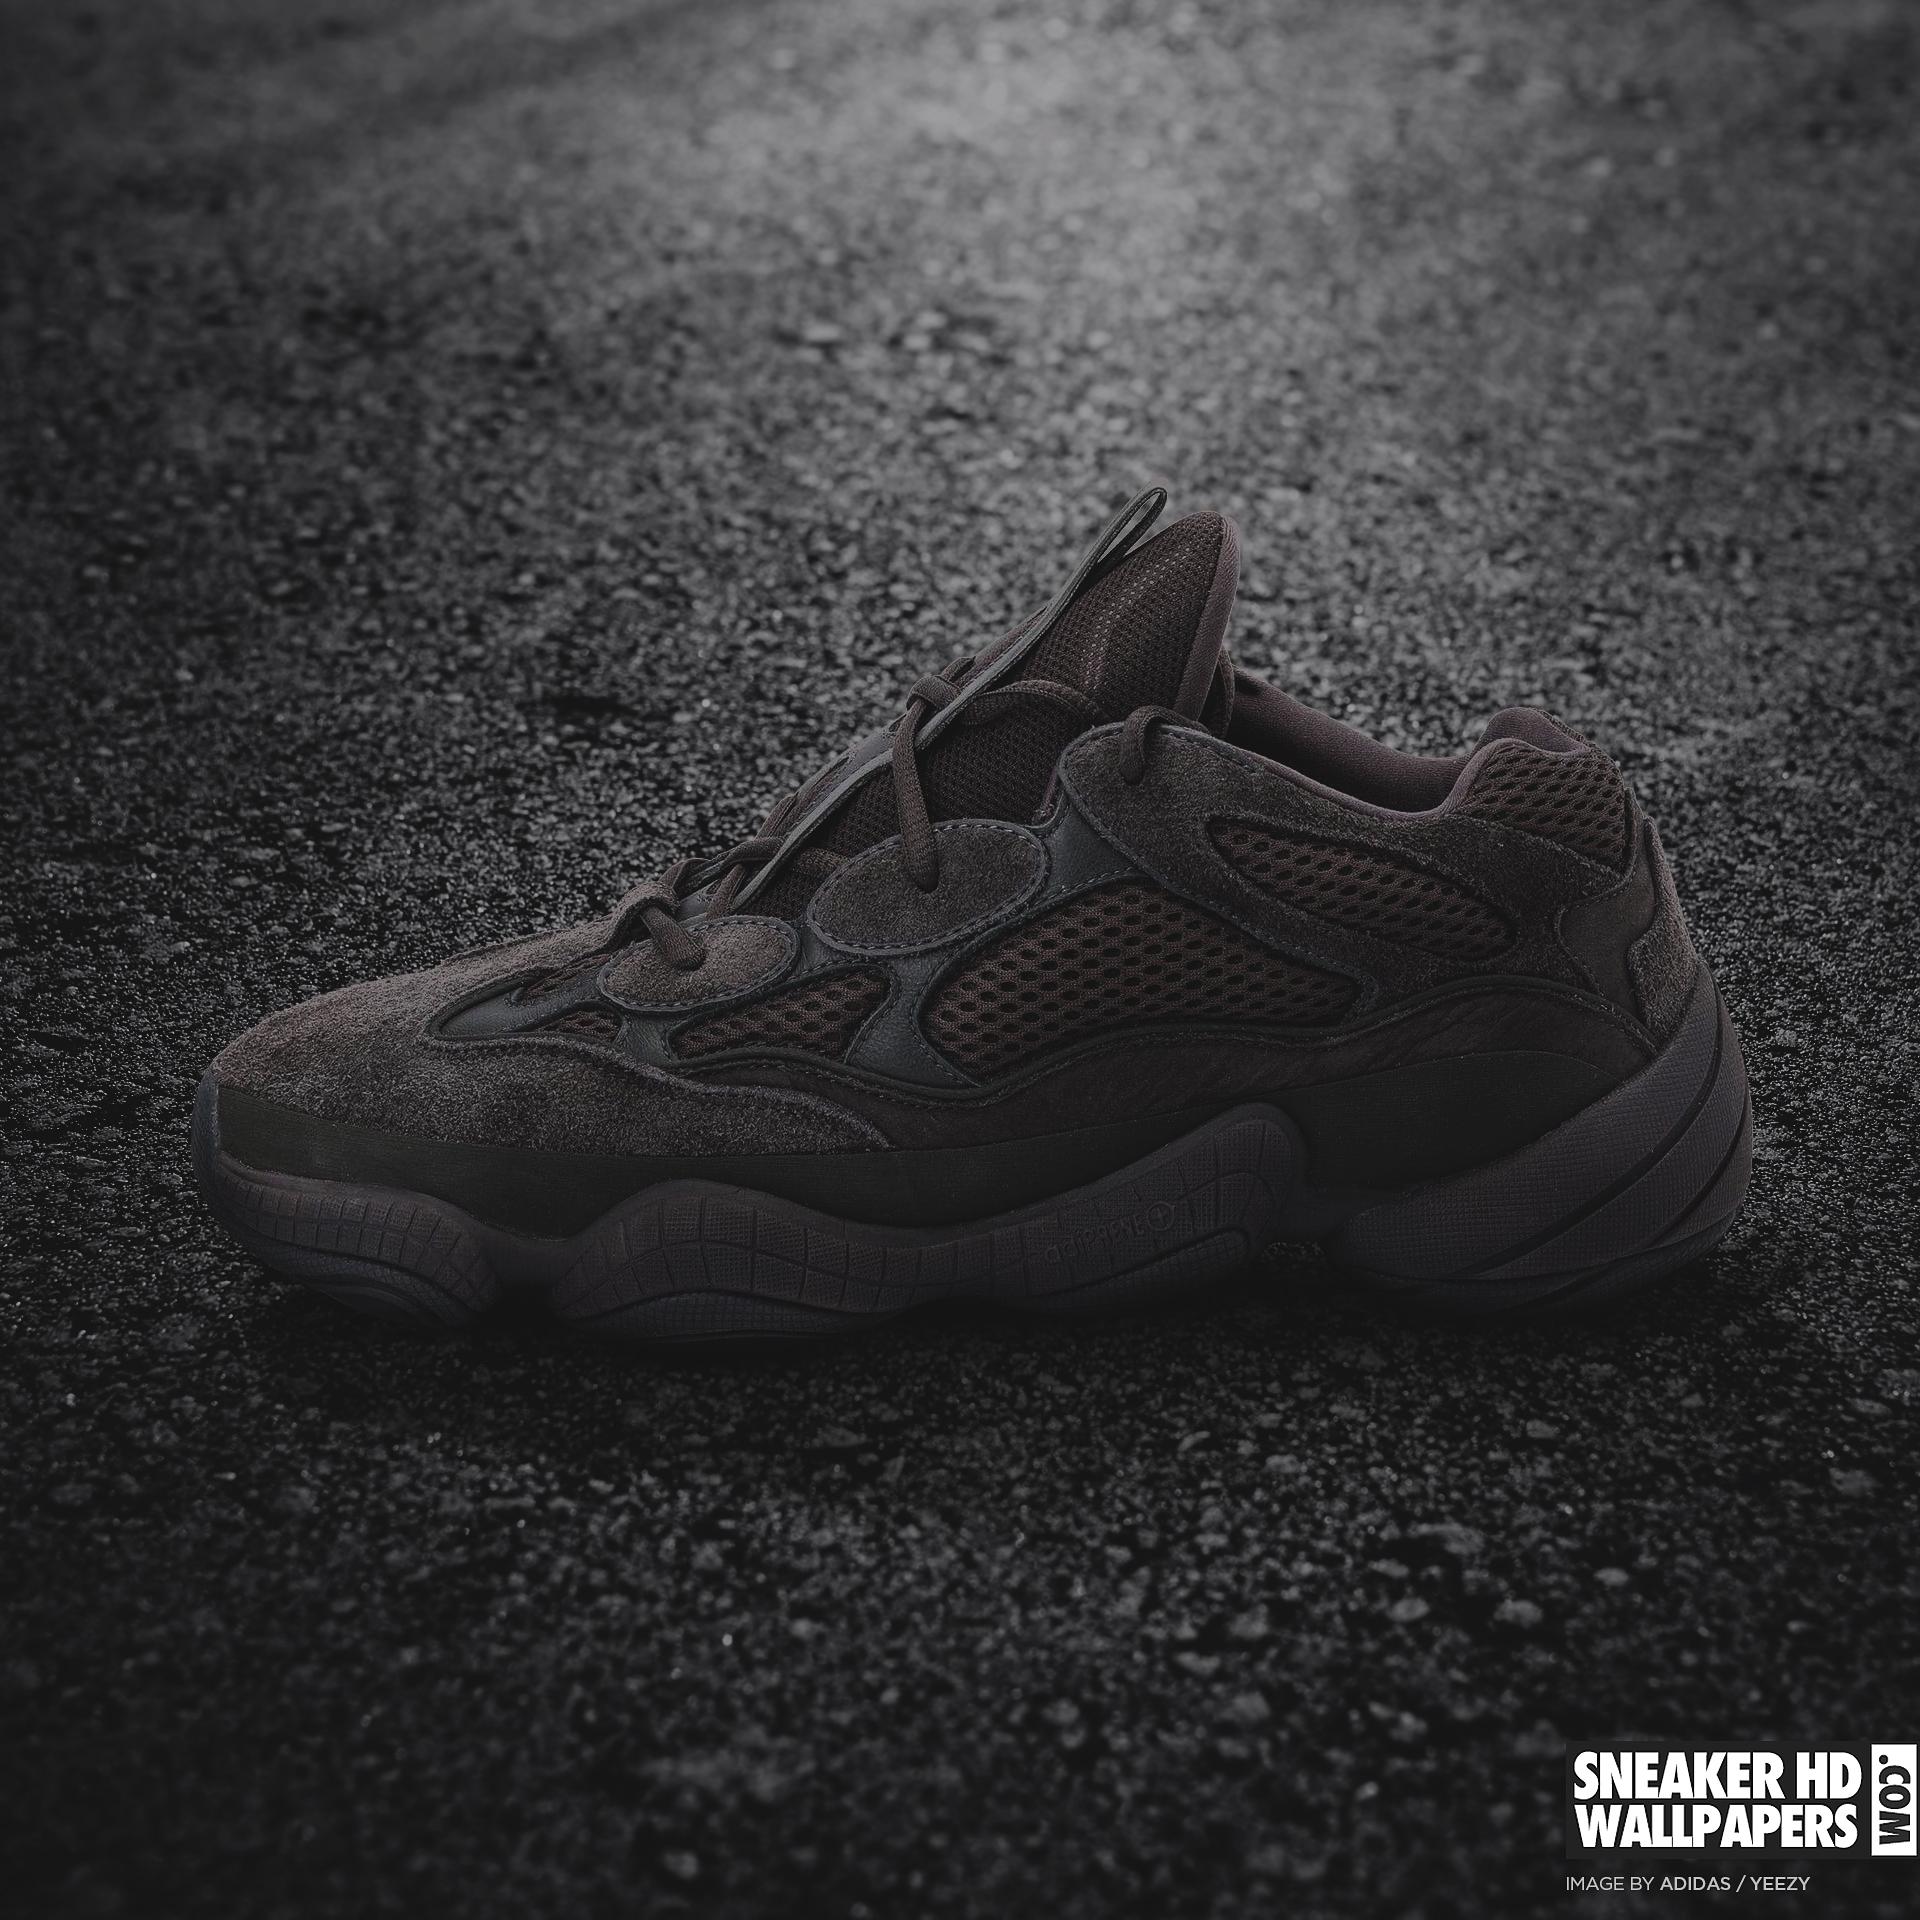 Kanye Wallpaper Iphone X Sneakerhdwallpapers Com Your Favorite Sneakers In Hd And